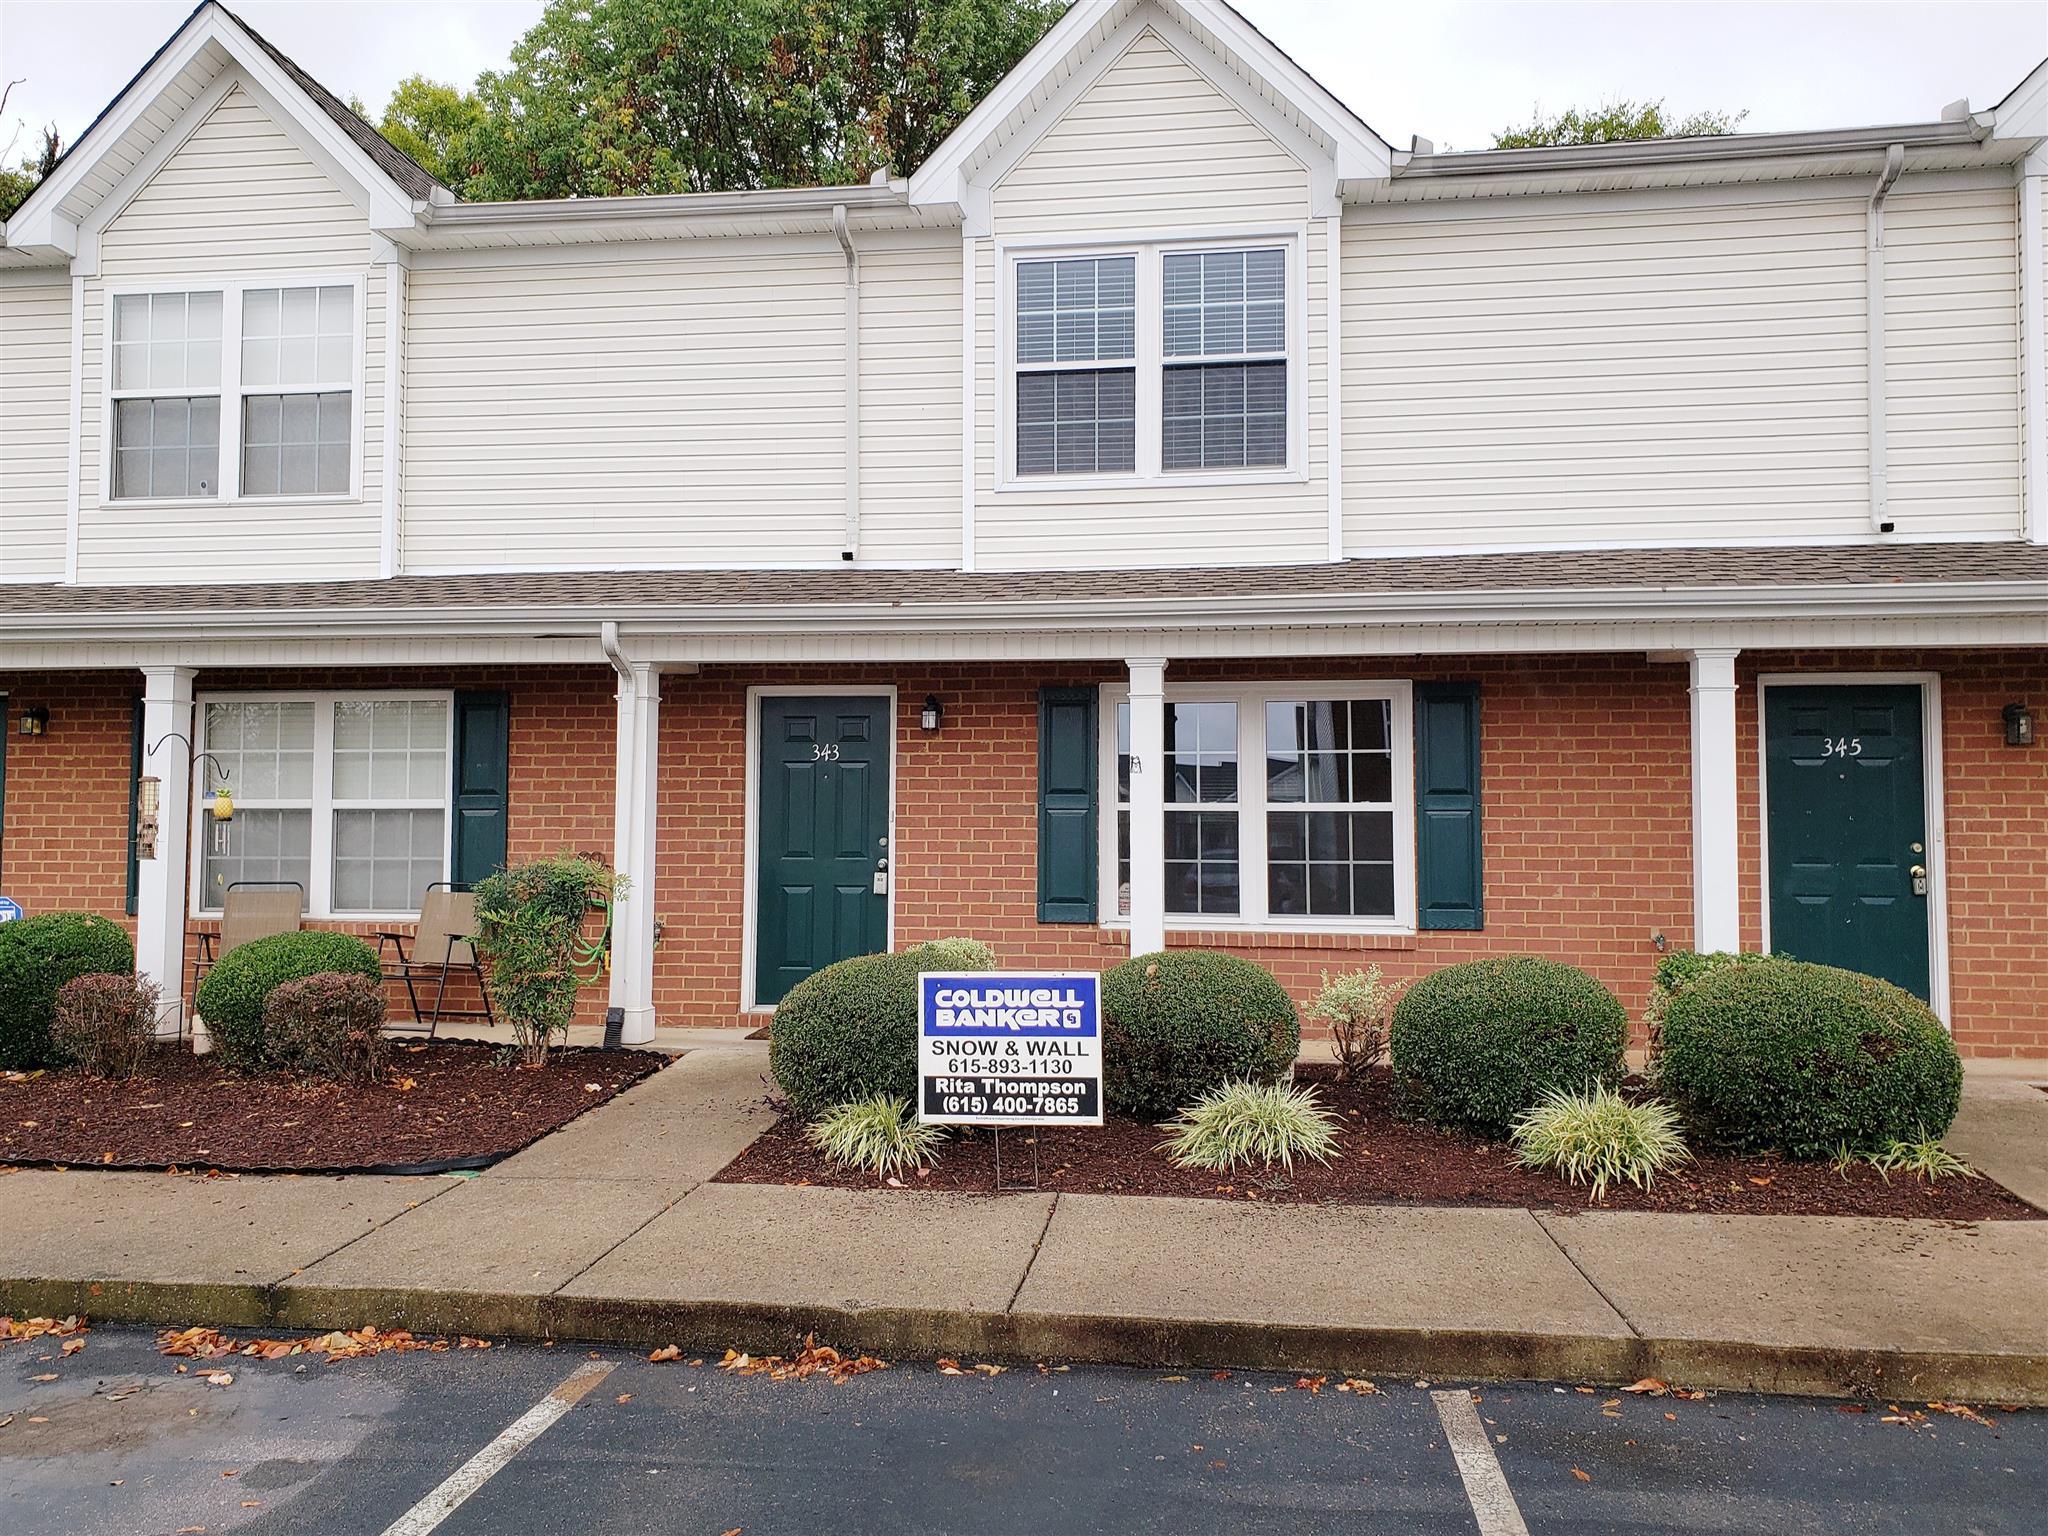 343 Shoshone Pl, Murfreesboro, TN 37128 - Murfreesboro, TN real estate listing